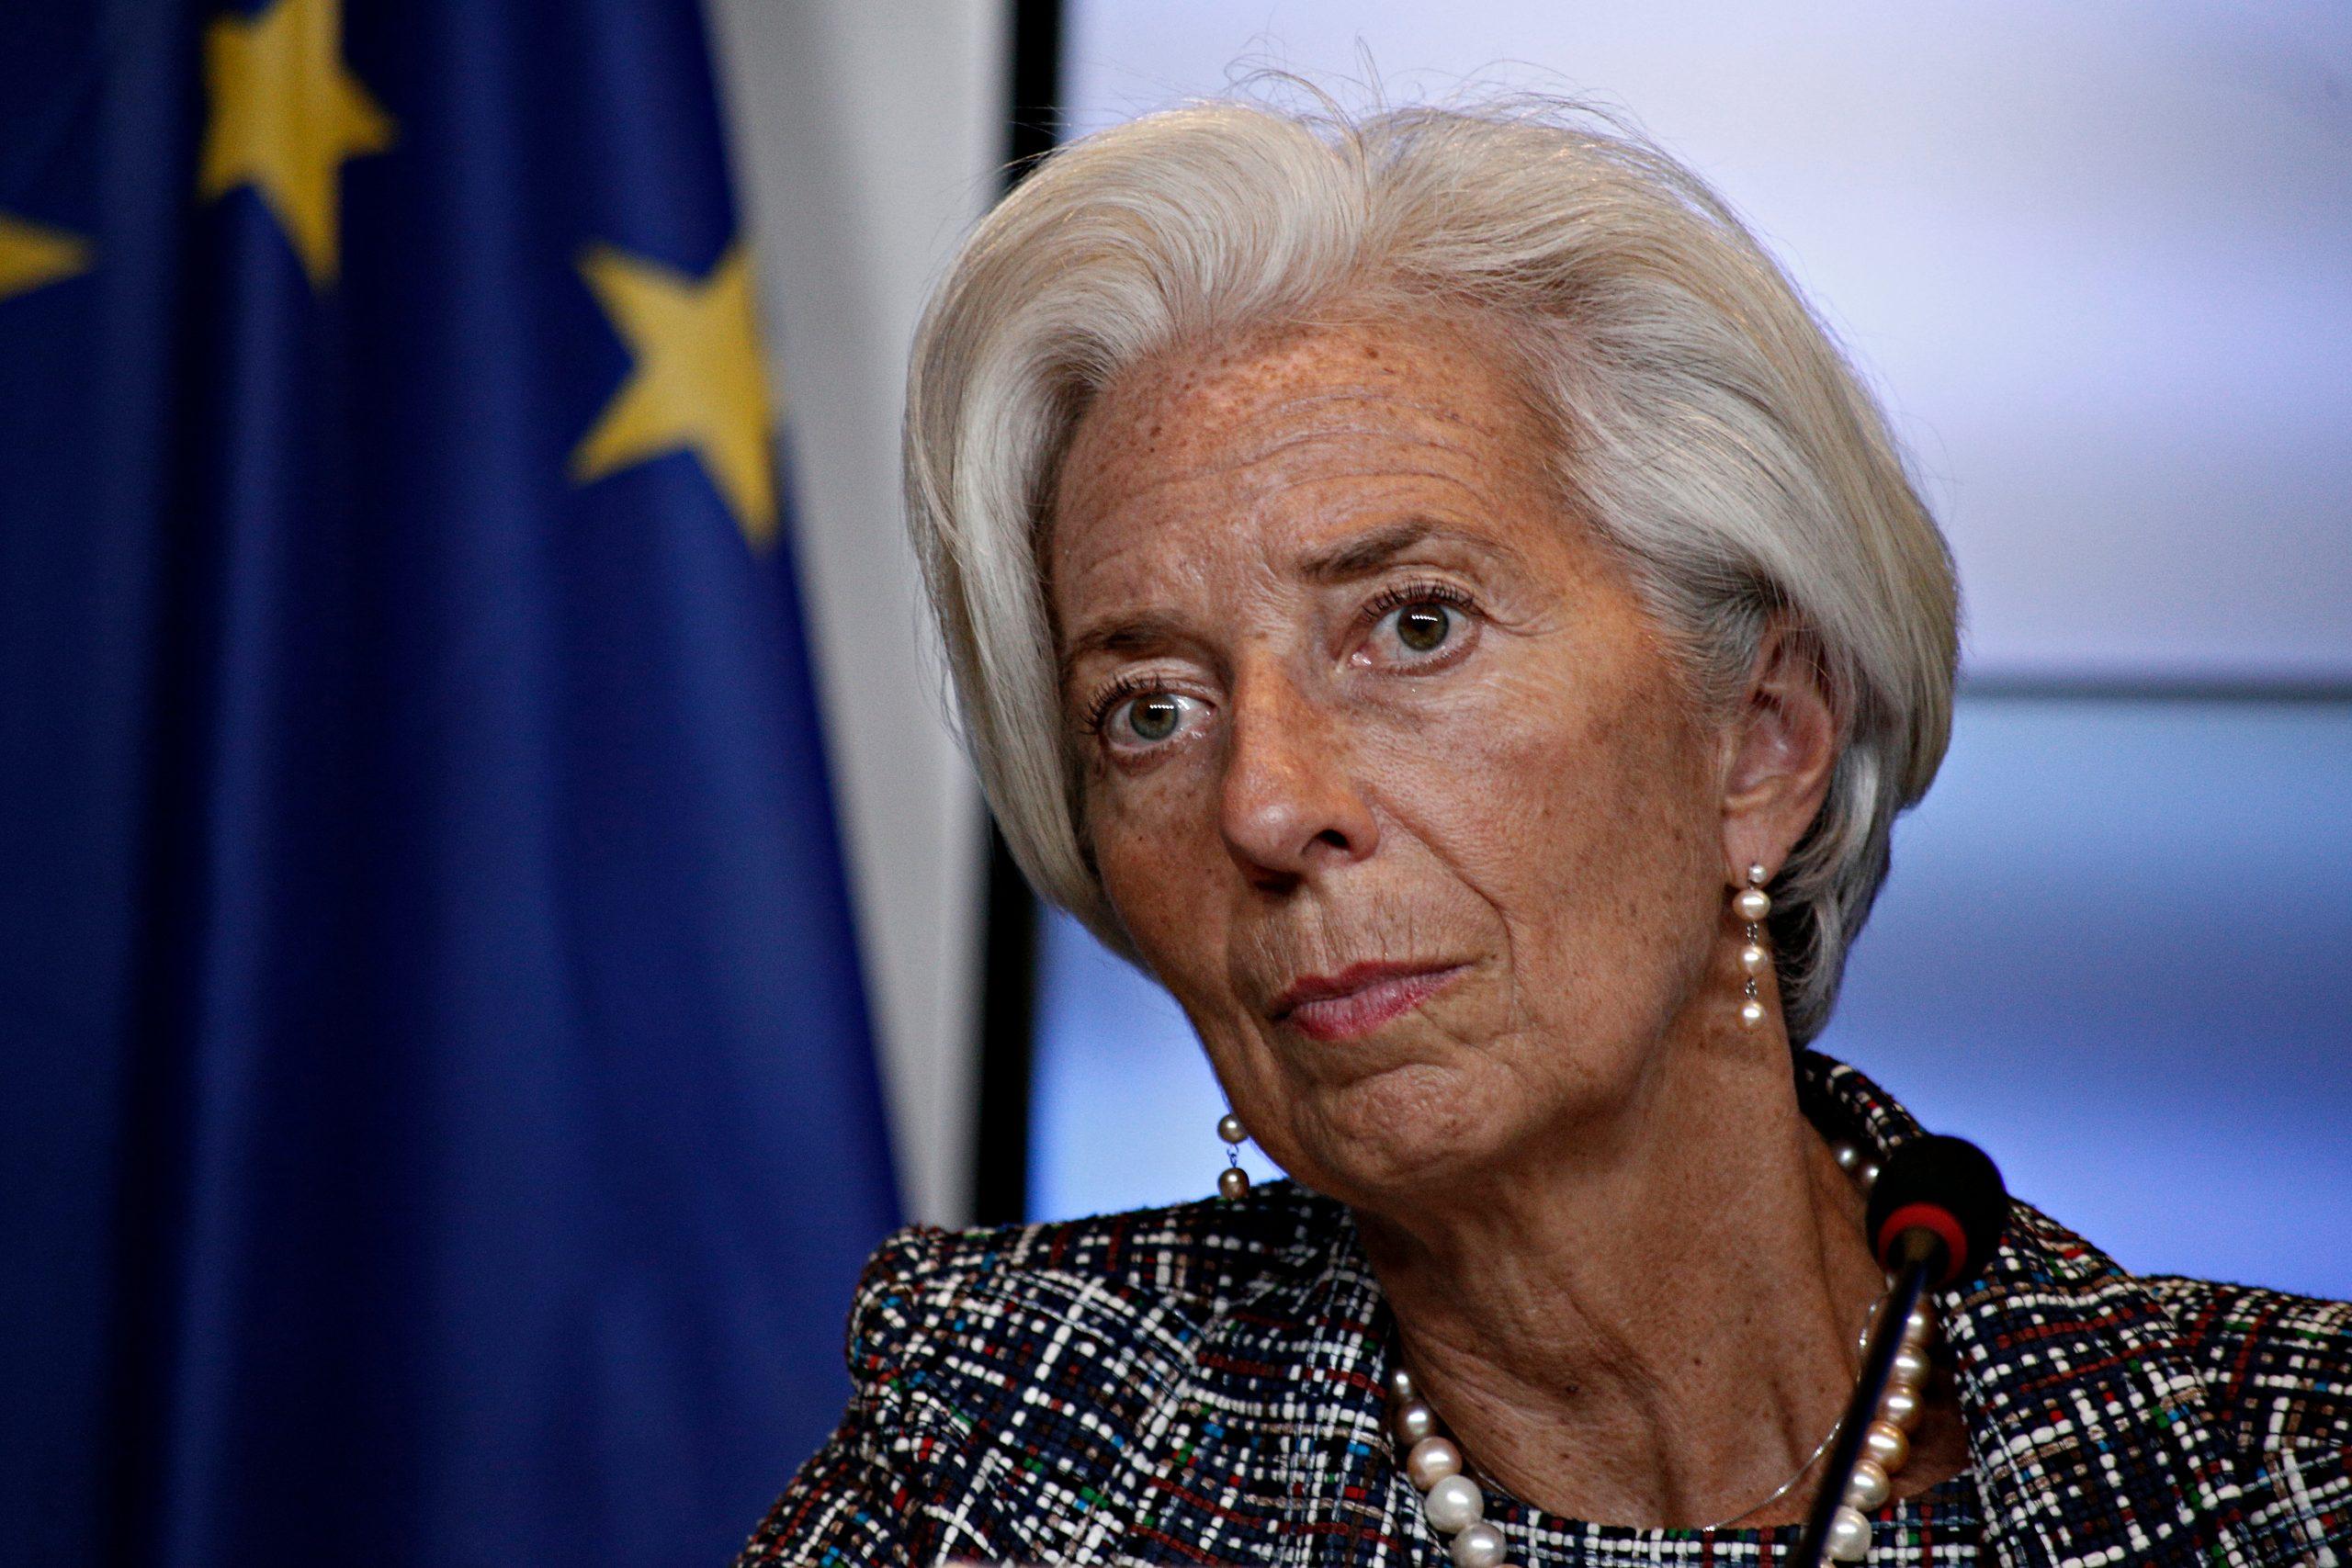 ECB's Lagarde strikes bullish tone on digital euro, says stablecoins 'pose serious risks'